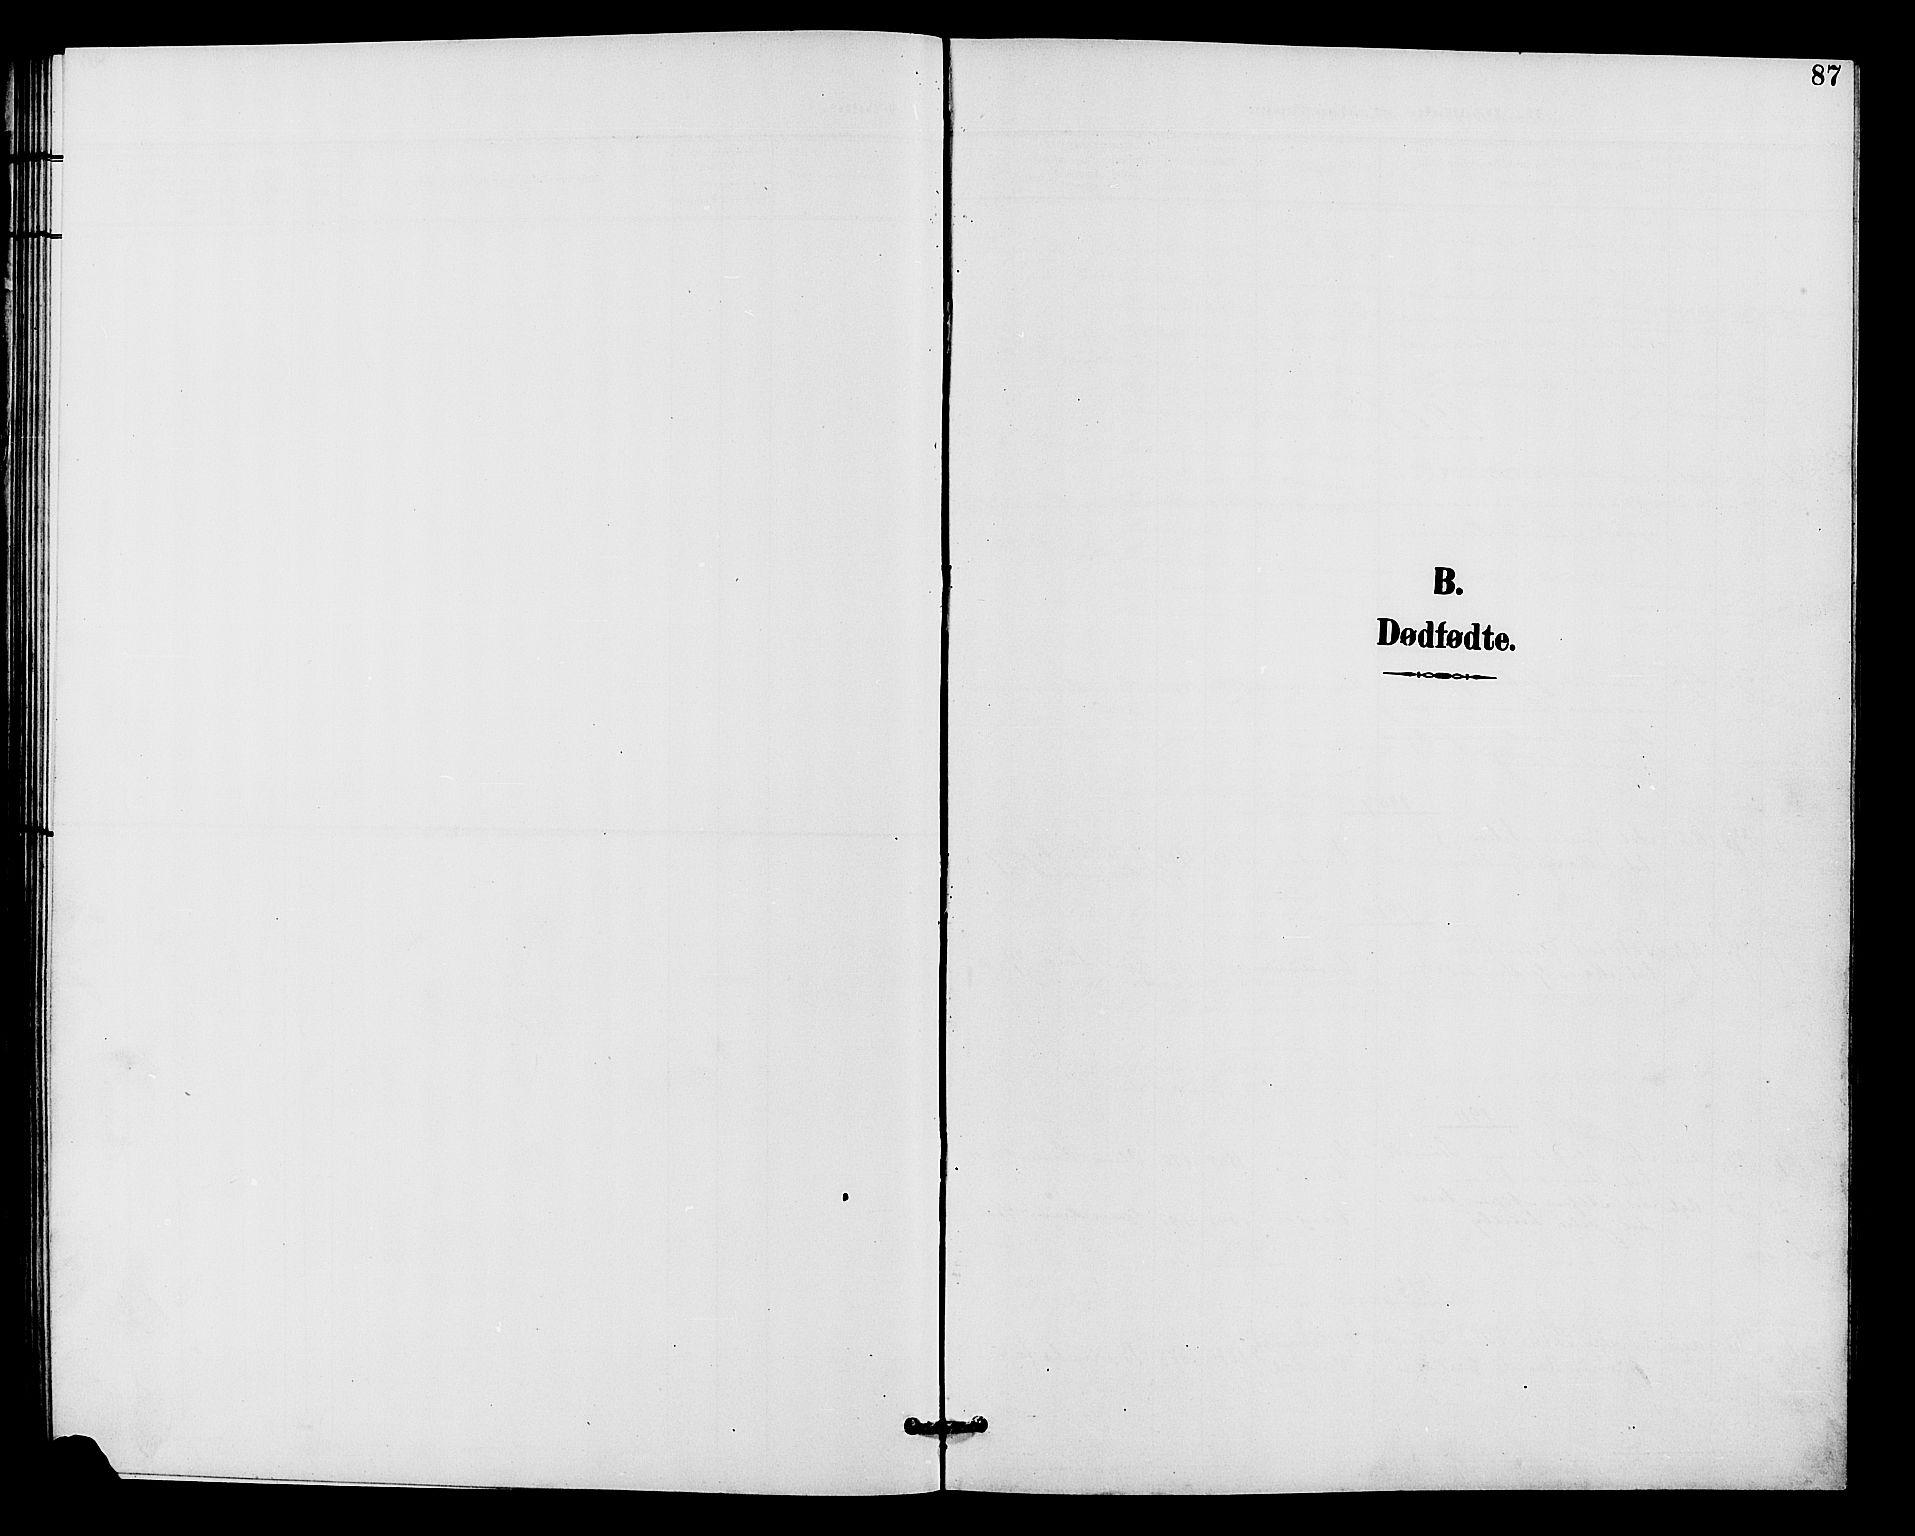 SAH, Vardal prestekontor, H/Ha/Hab/L0011: Klokkerbok nr. 11, 1899-1913, s. 87